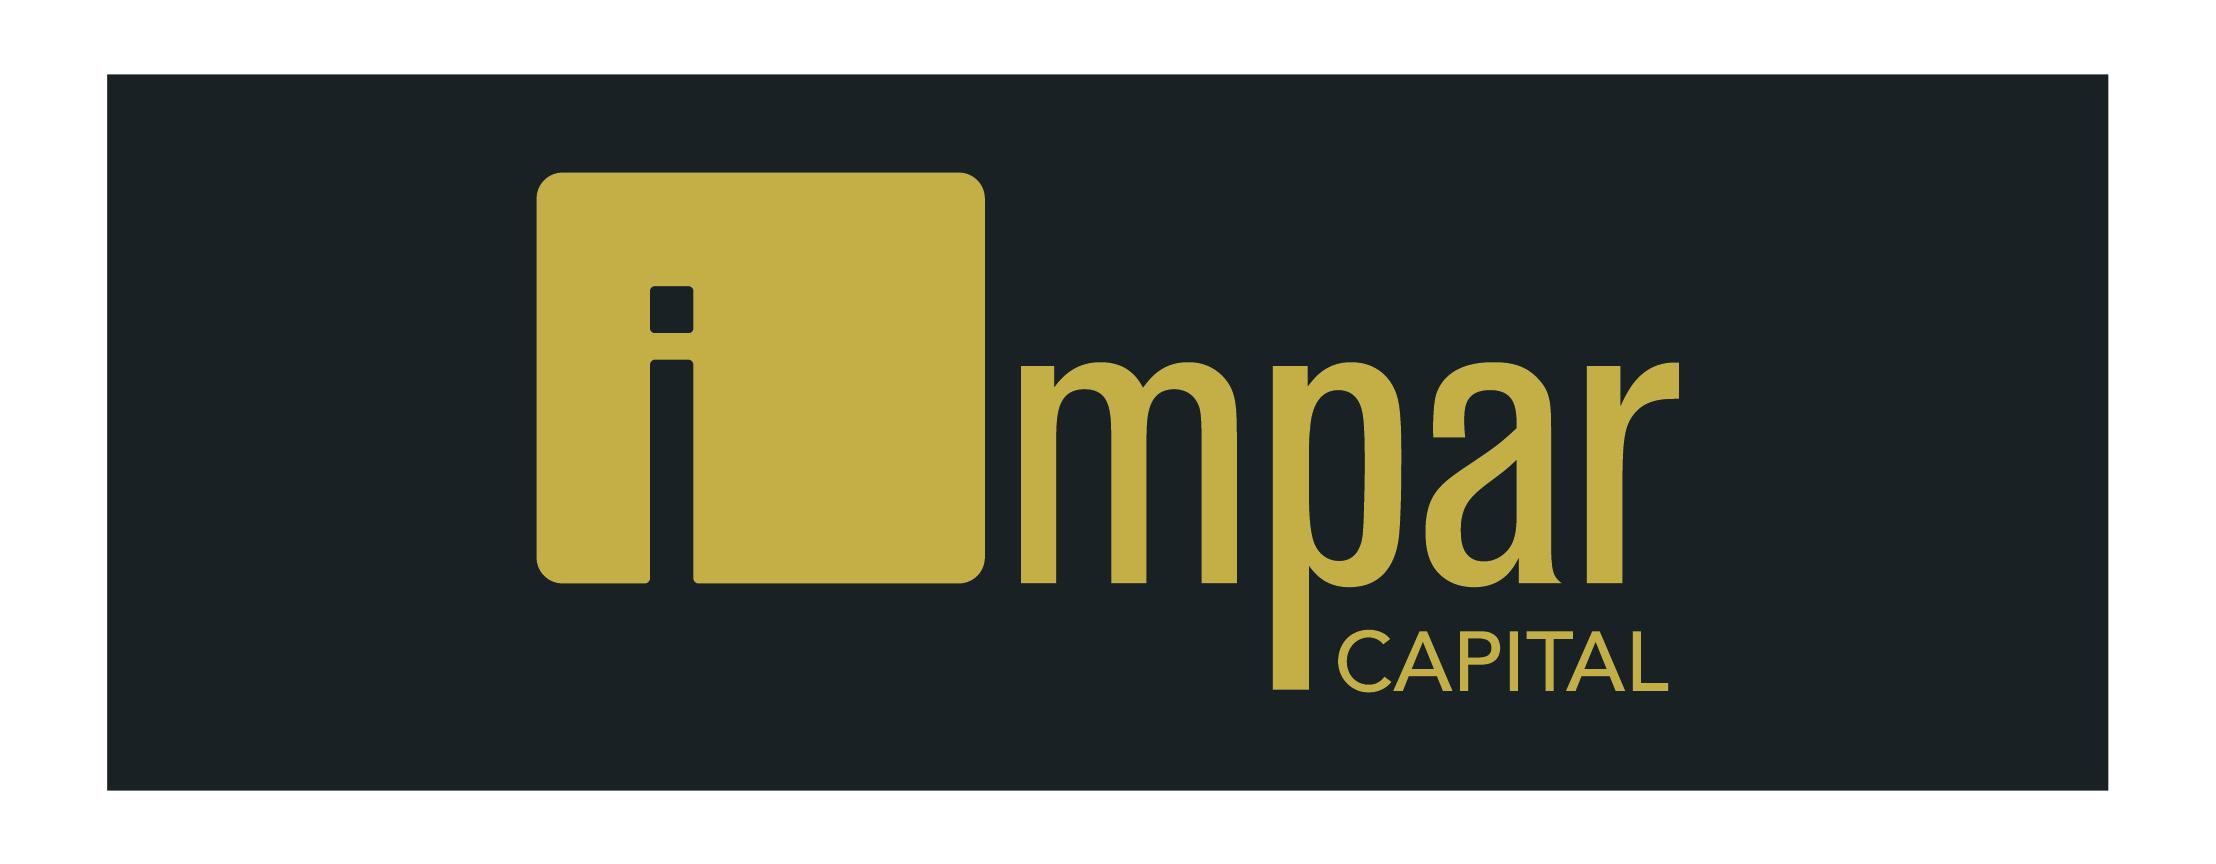 Impar Capital